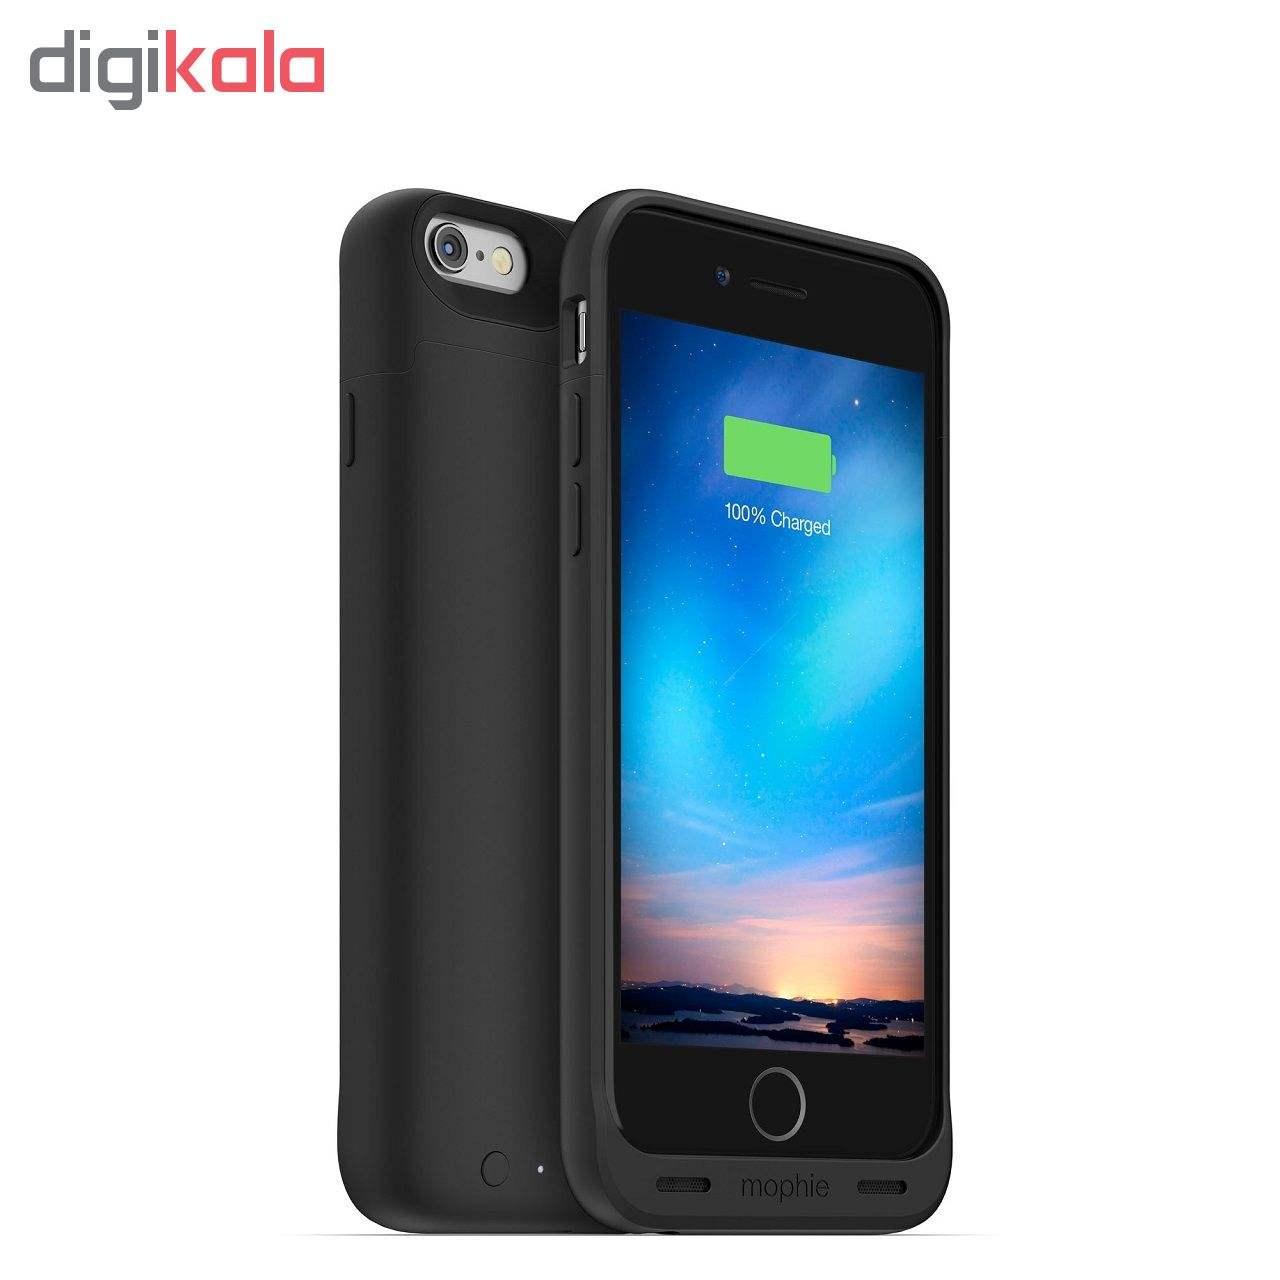 کاور شارژ مدل pack air ظرفیت 2750میلی آمپر ساعت مناسب برای گوشی موبایل اپل iphone 6plus / 6plus